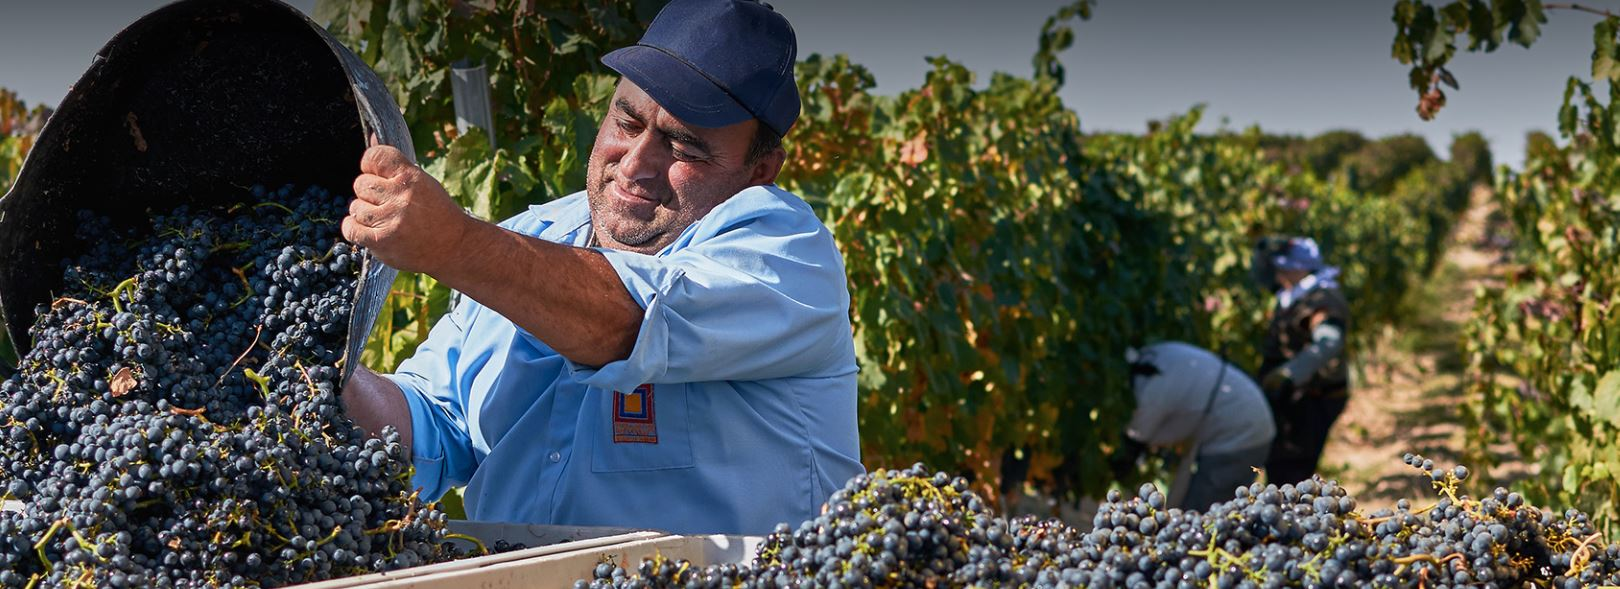 Karas grapes